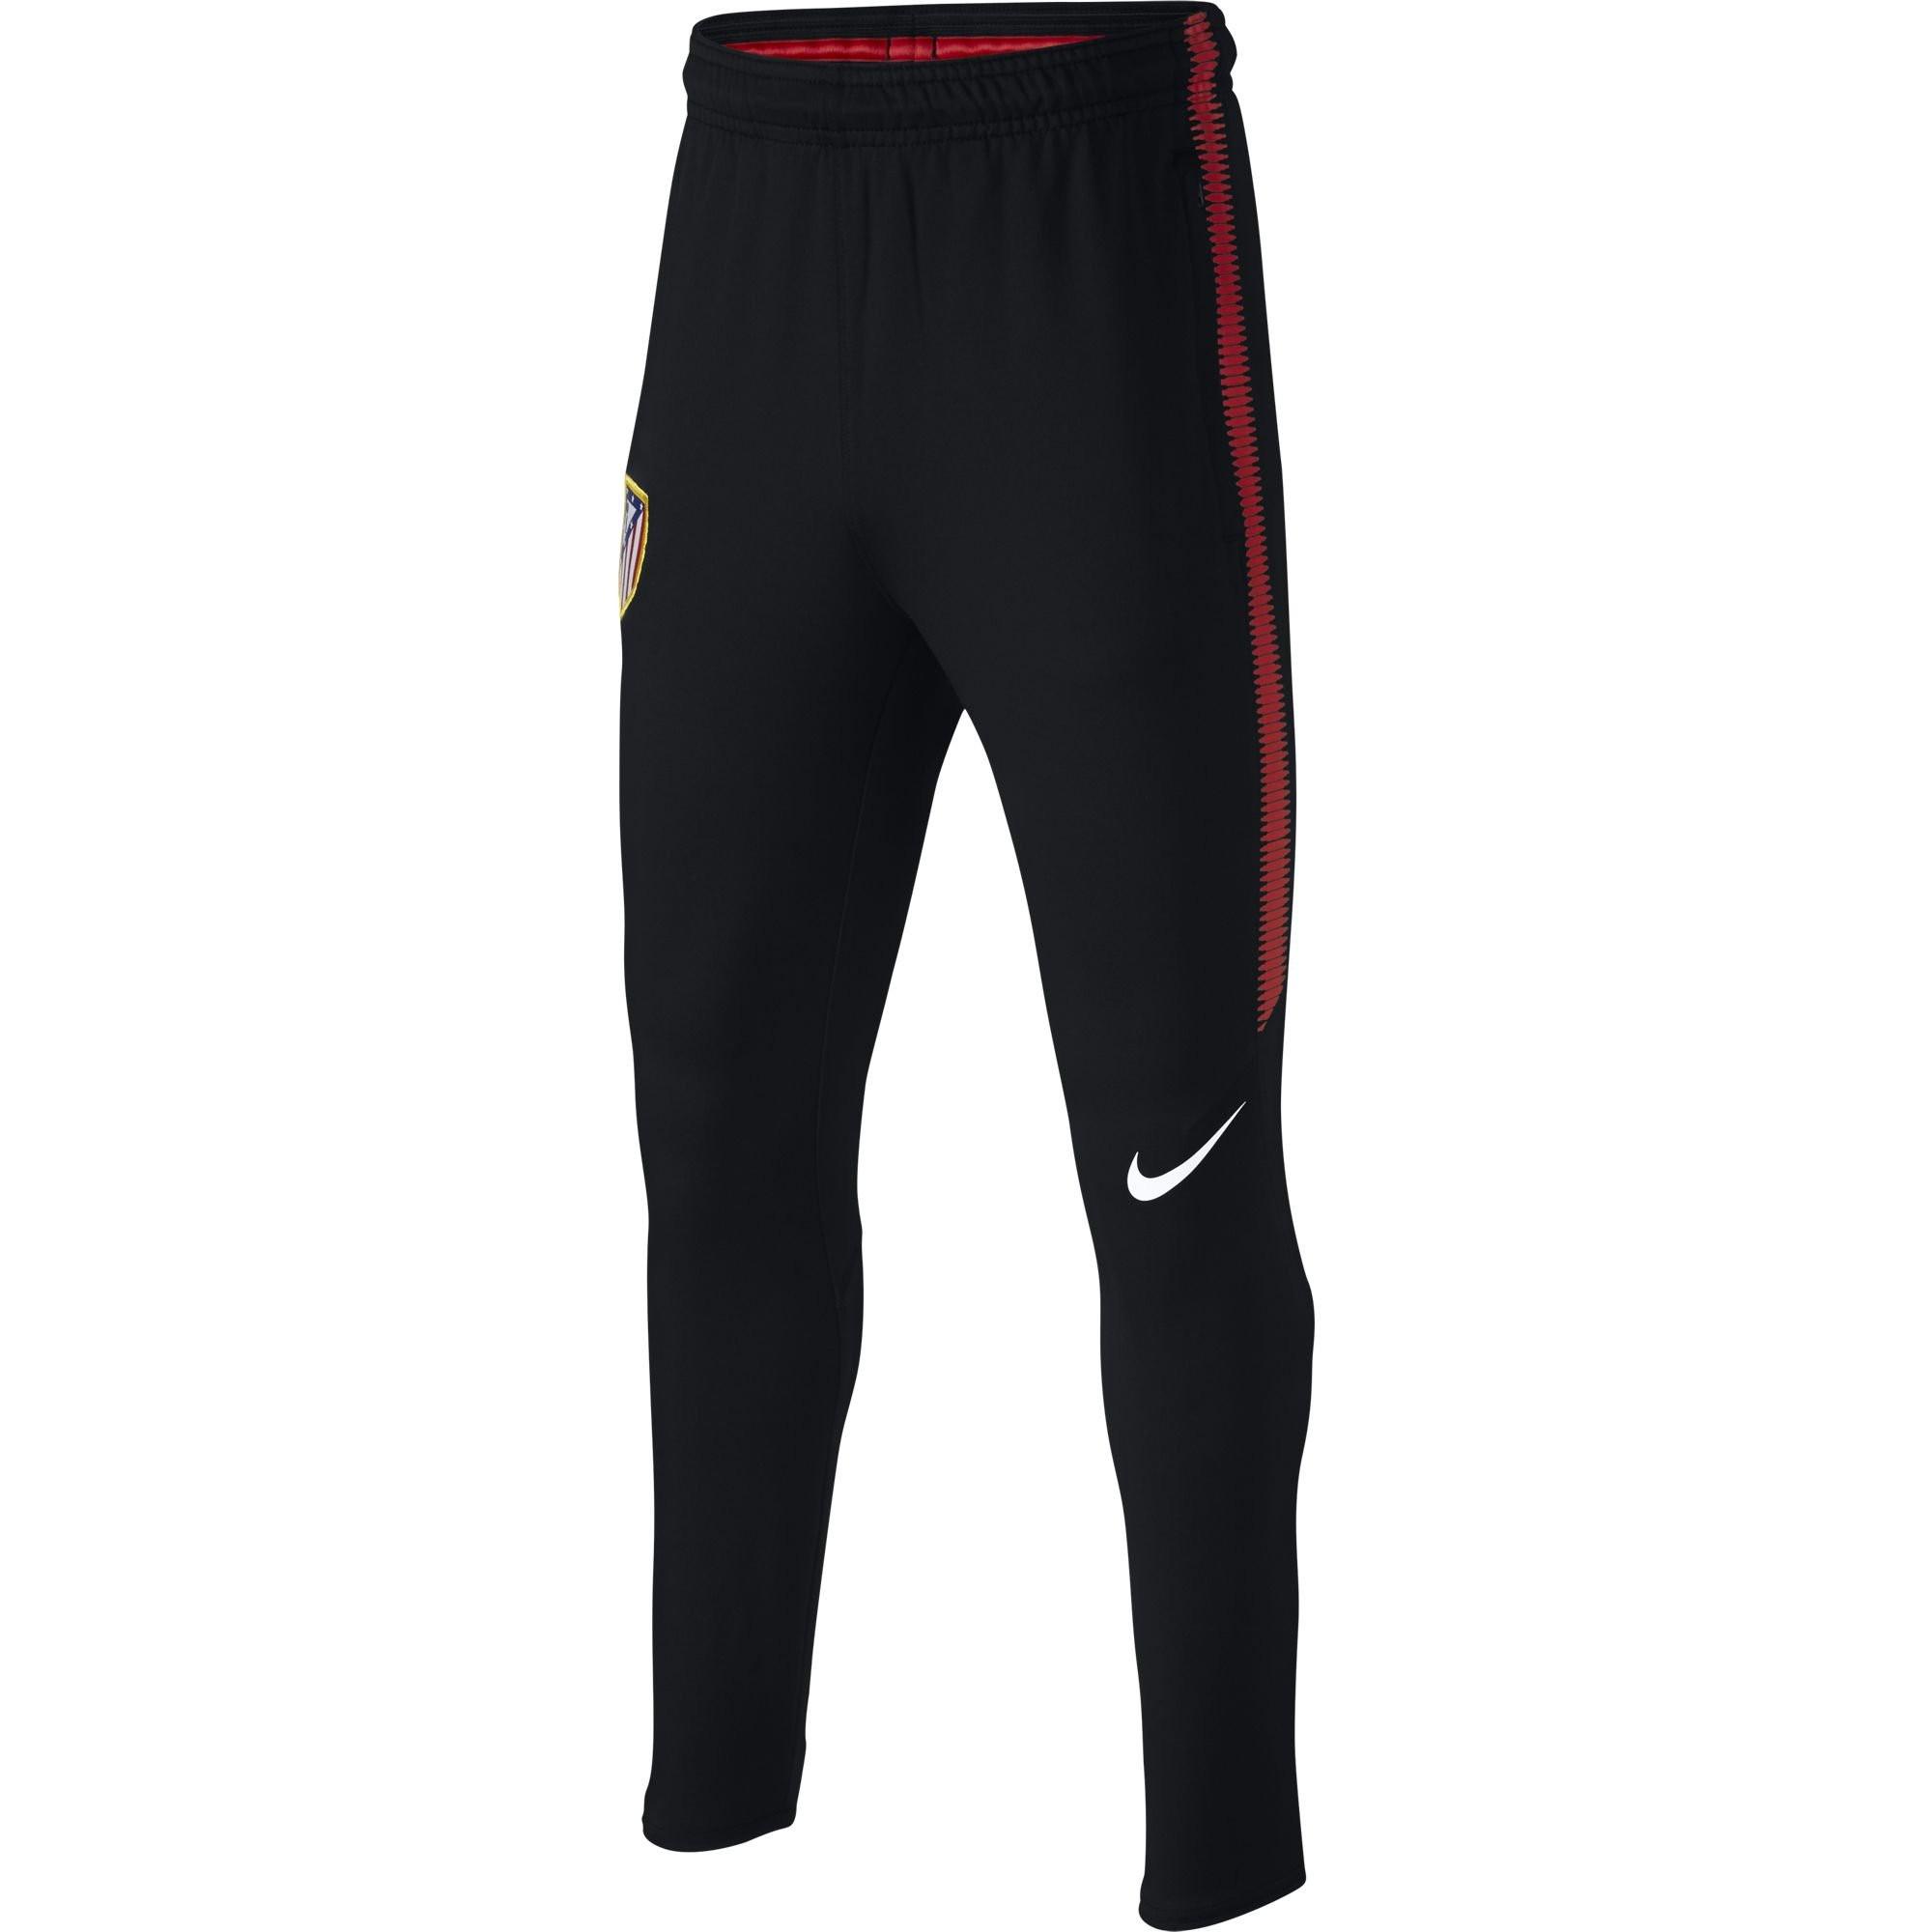 Nike Noir Pantalon Atletico Trg Madrid Junior Pant 20172018 ZiTOXuwlPk